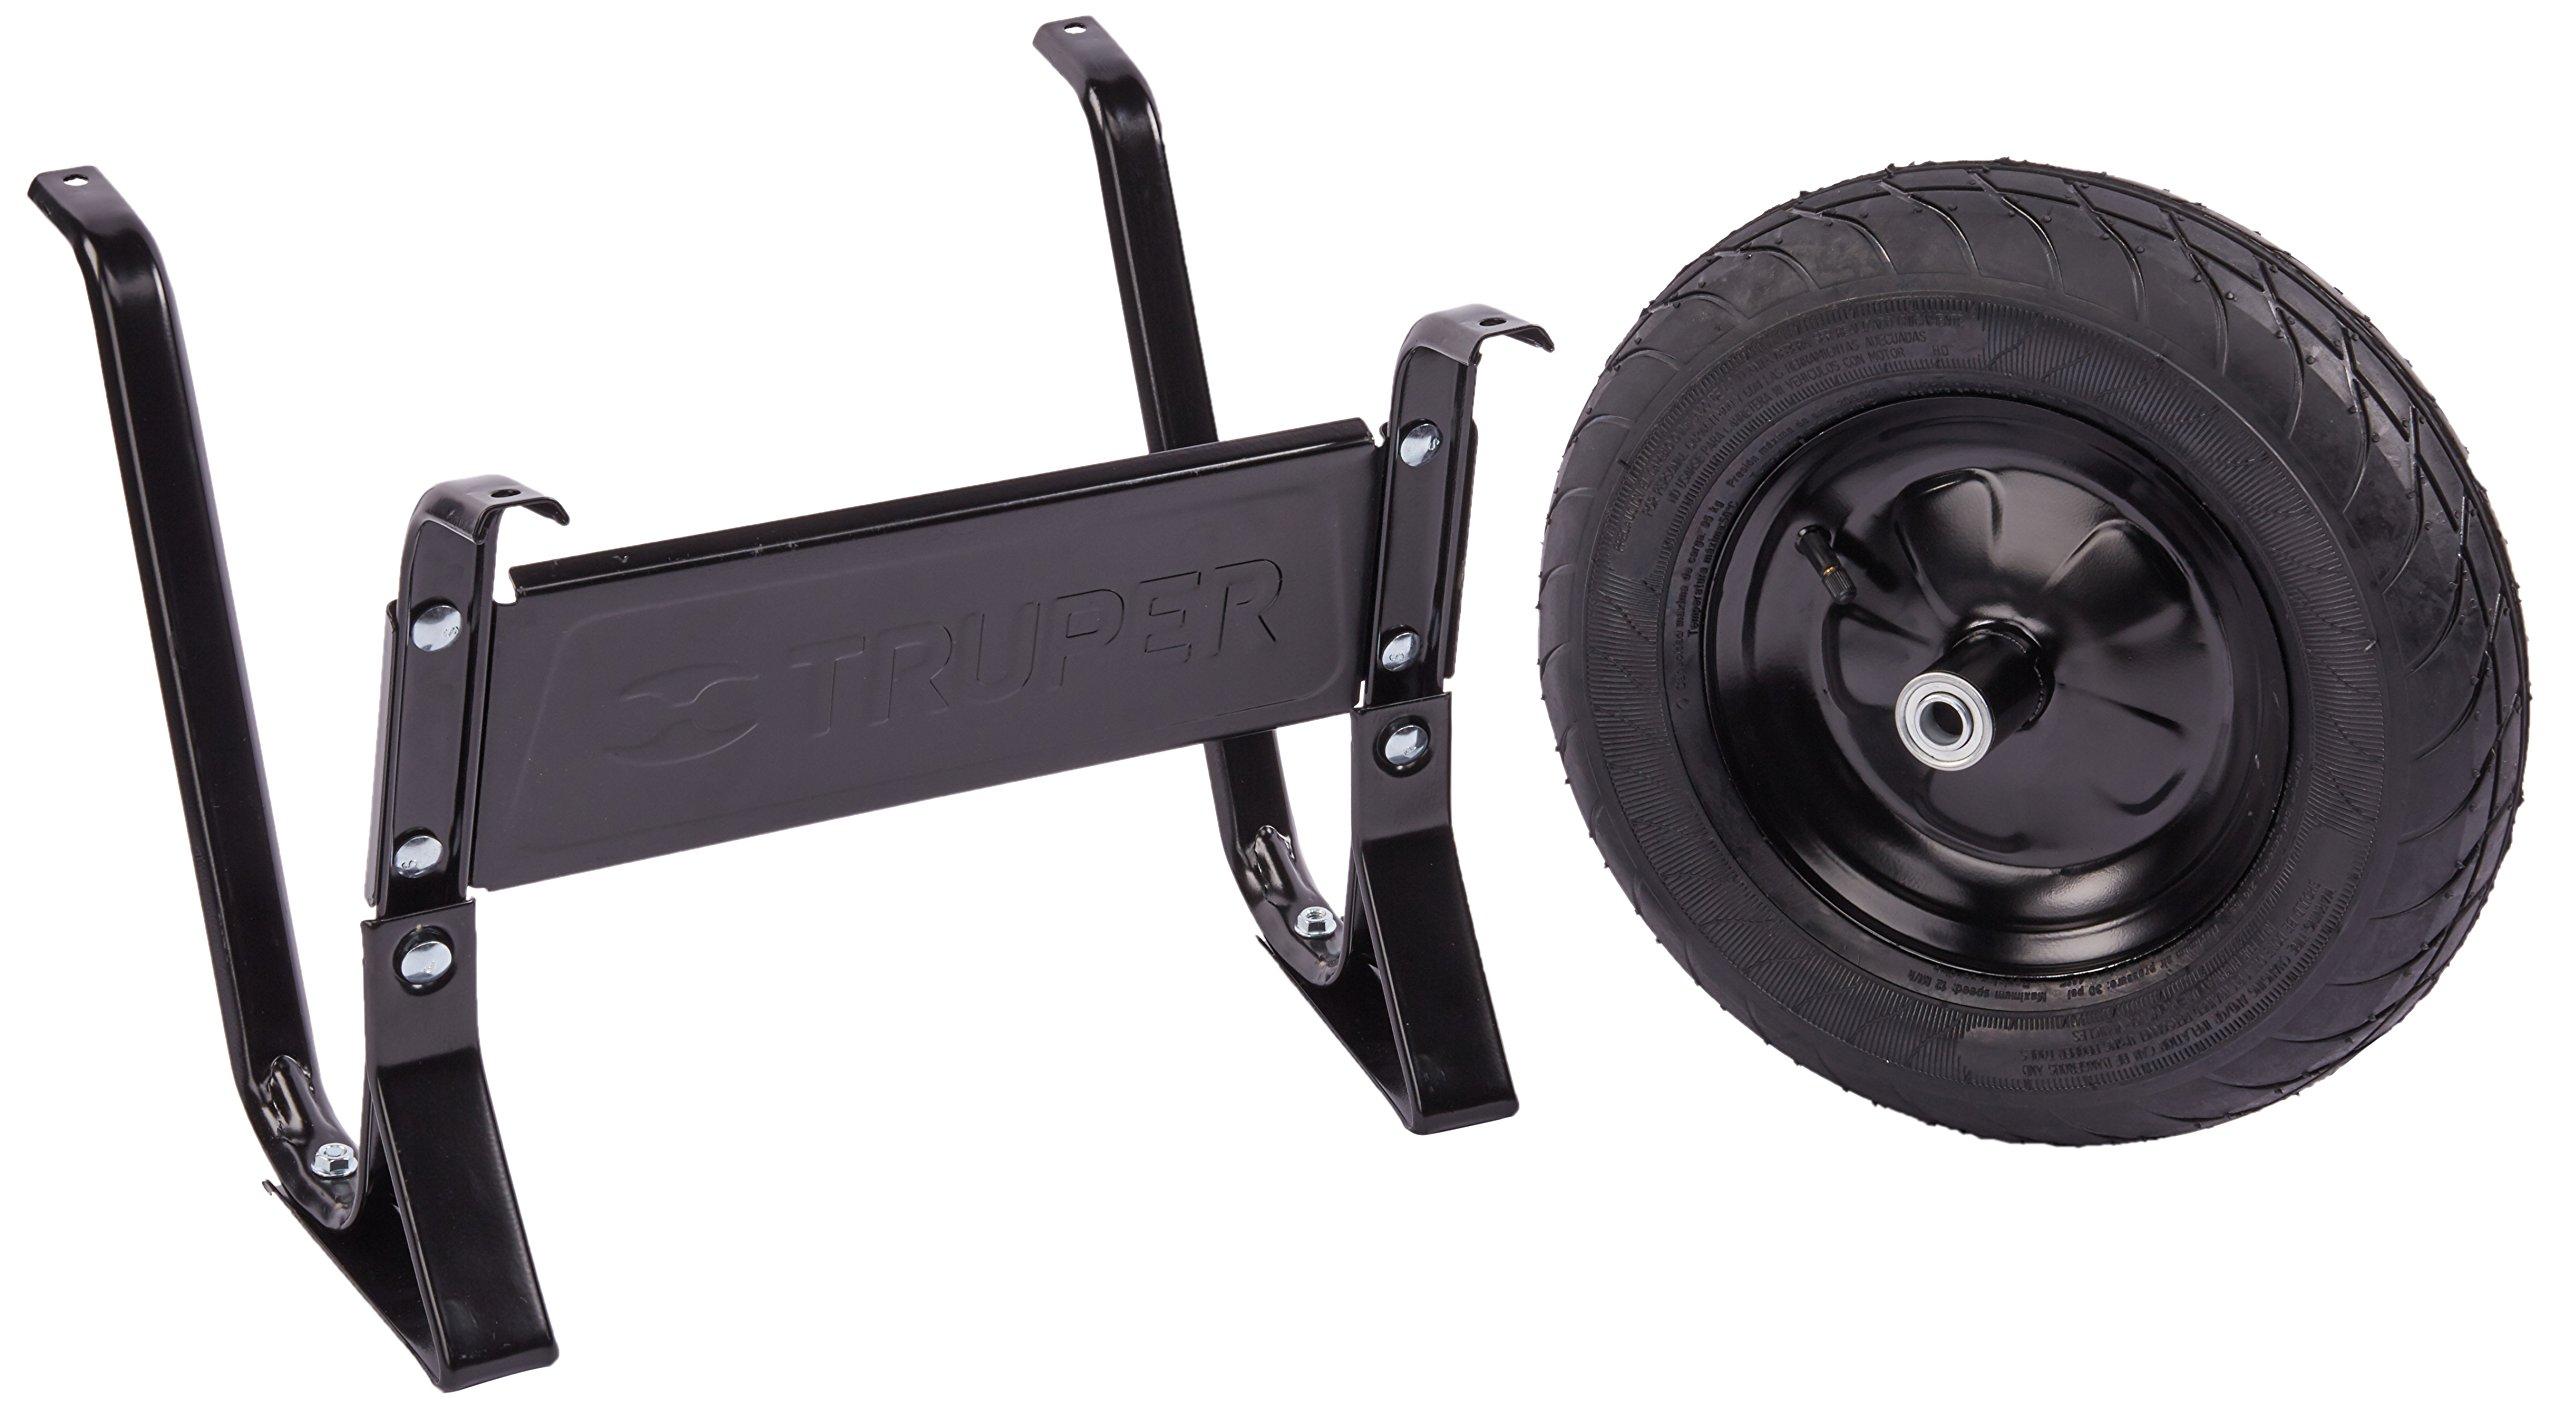 TRUPER CALLSS Tire and Accessory Boxes for Wheelbarrows. Block Pneumatic